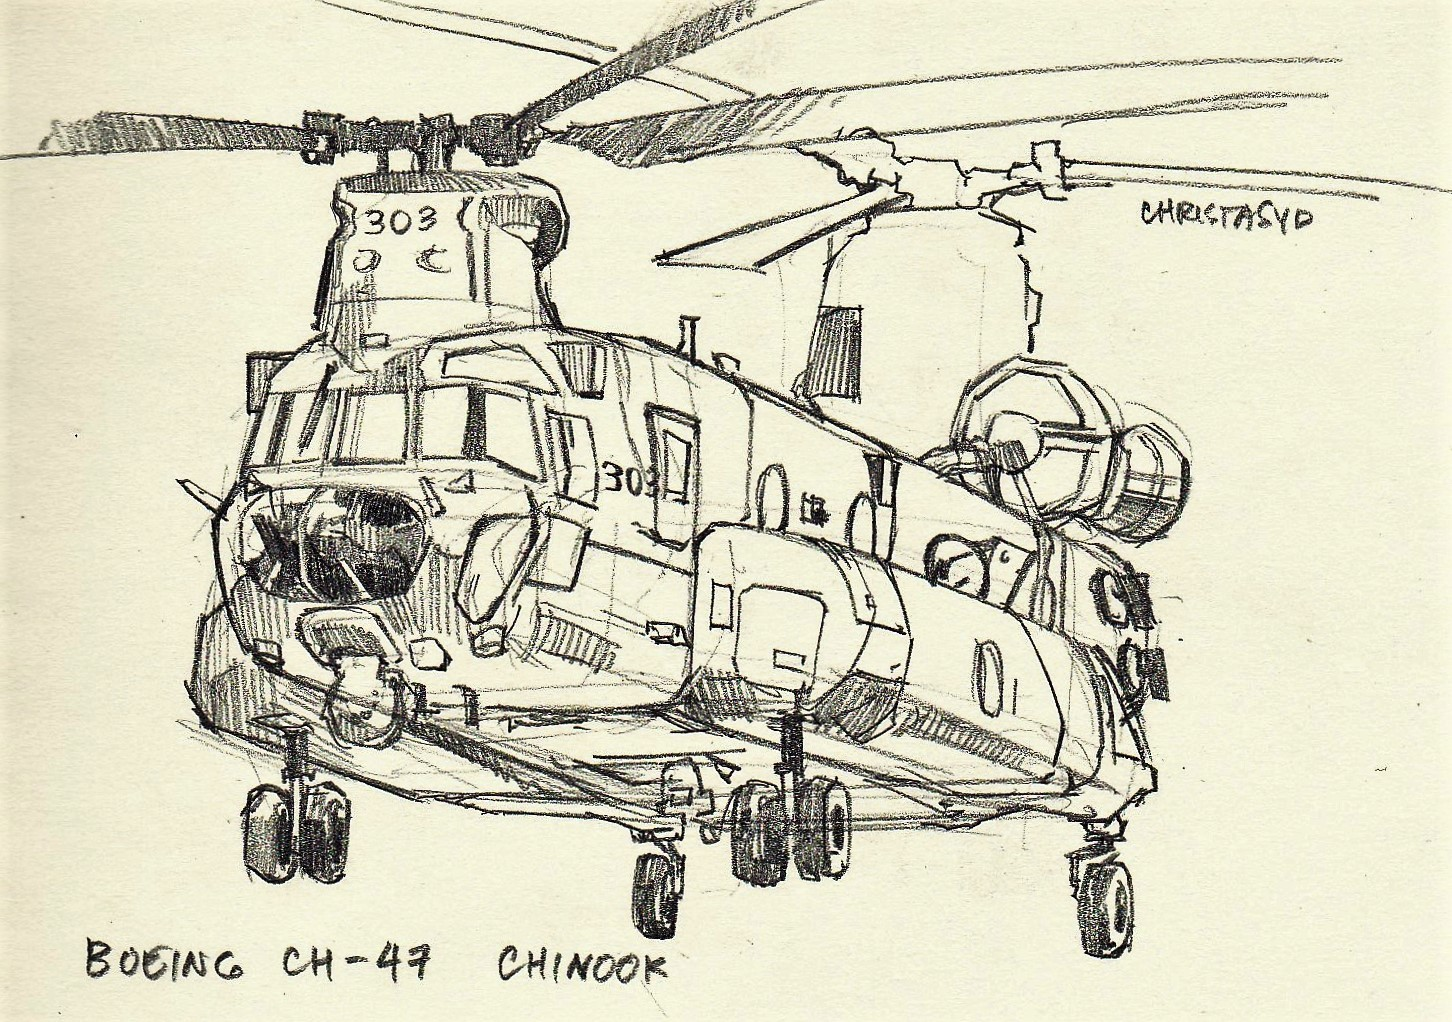 boeing ch 47 chinook study  [ 1452 x 1022 Pixel ]